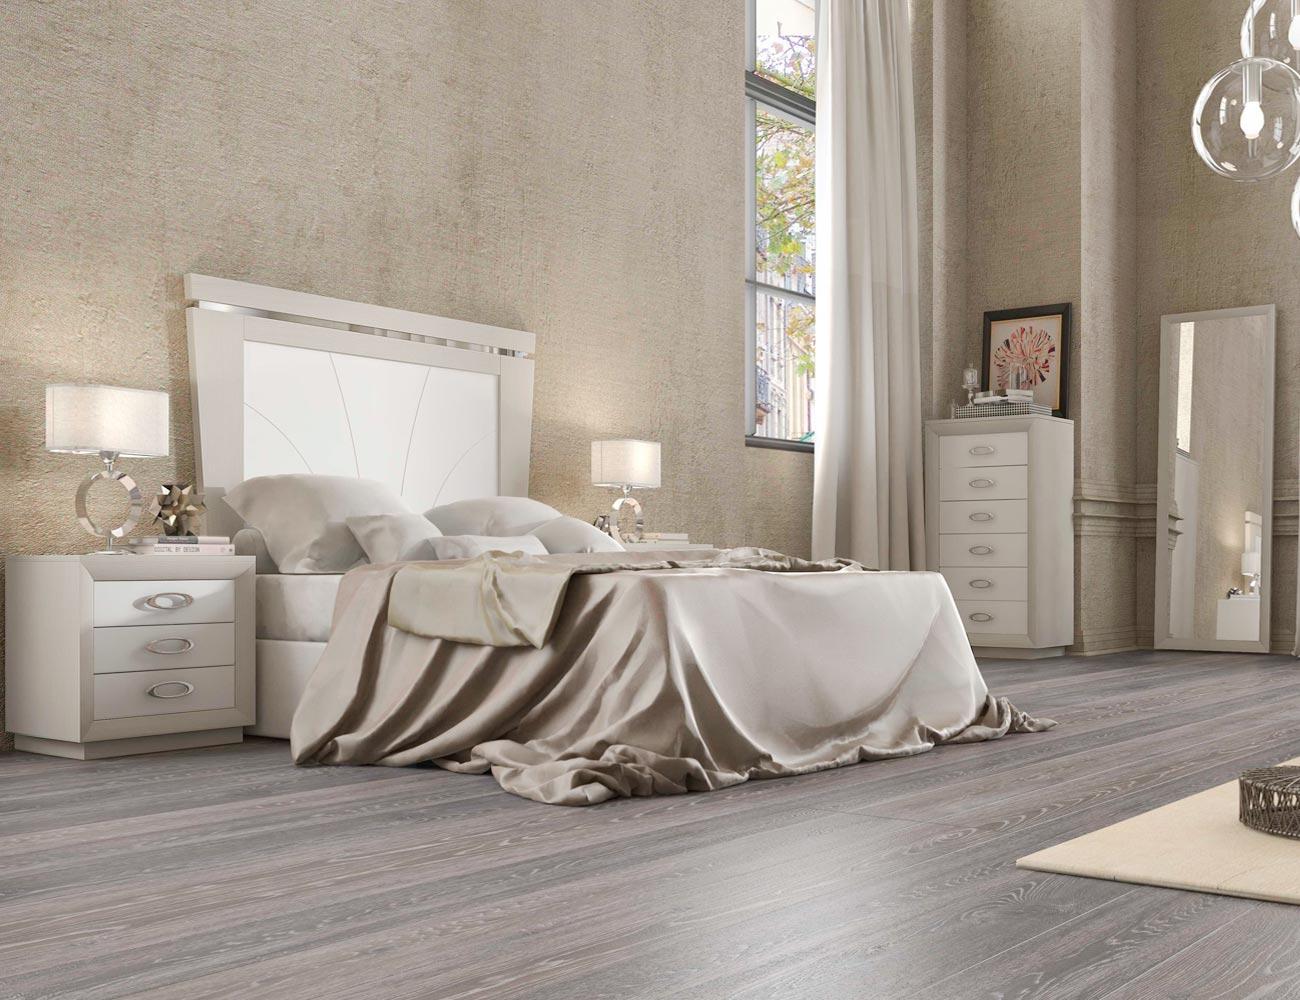 Dormitorio matrimonio neoclasico 3